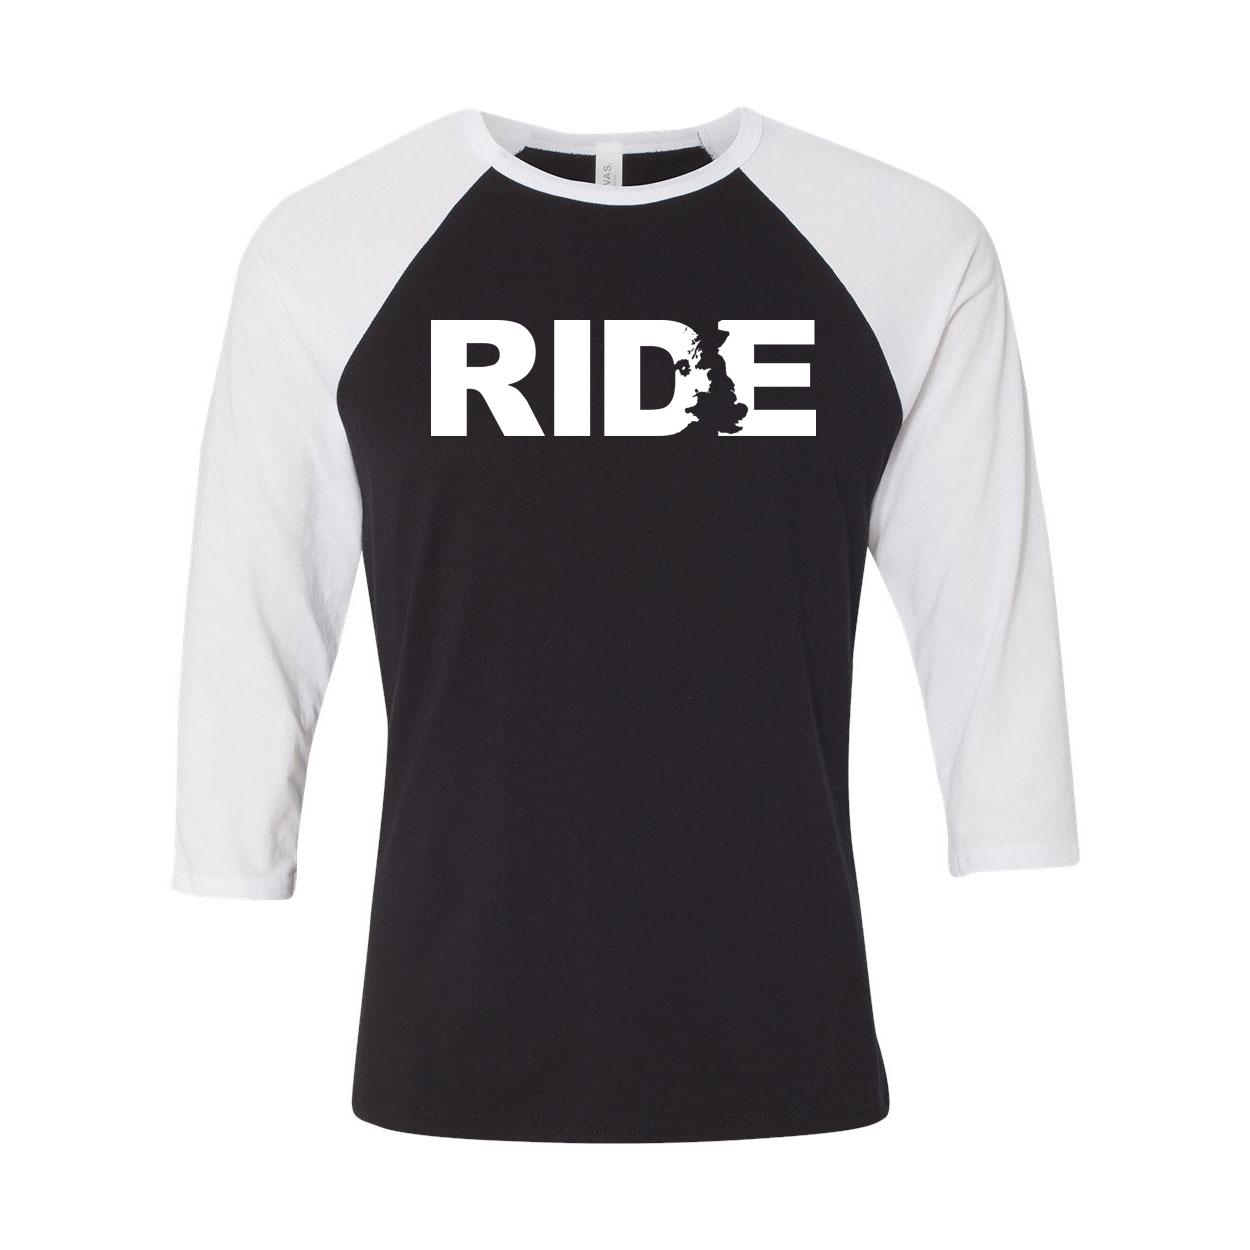 Ride United Kingdom Classic Raglan Shirt Black/White (White Logo)